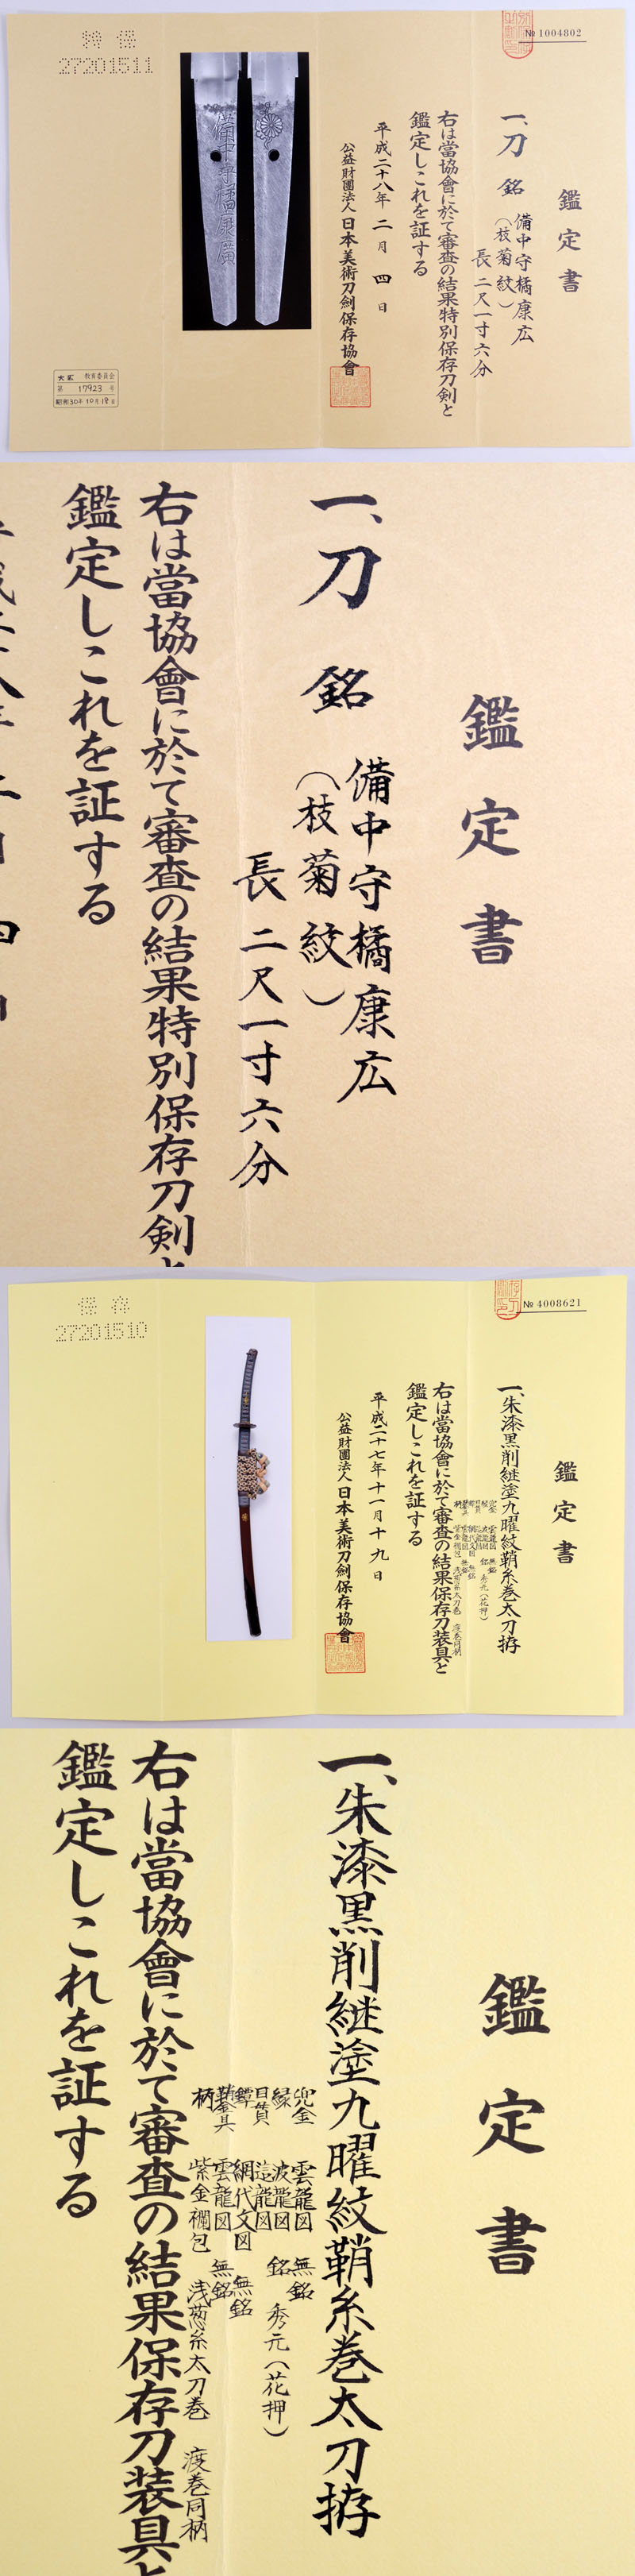 備中守橘康広(枝菊紋) Picture of Certificate